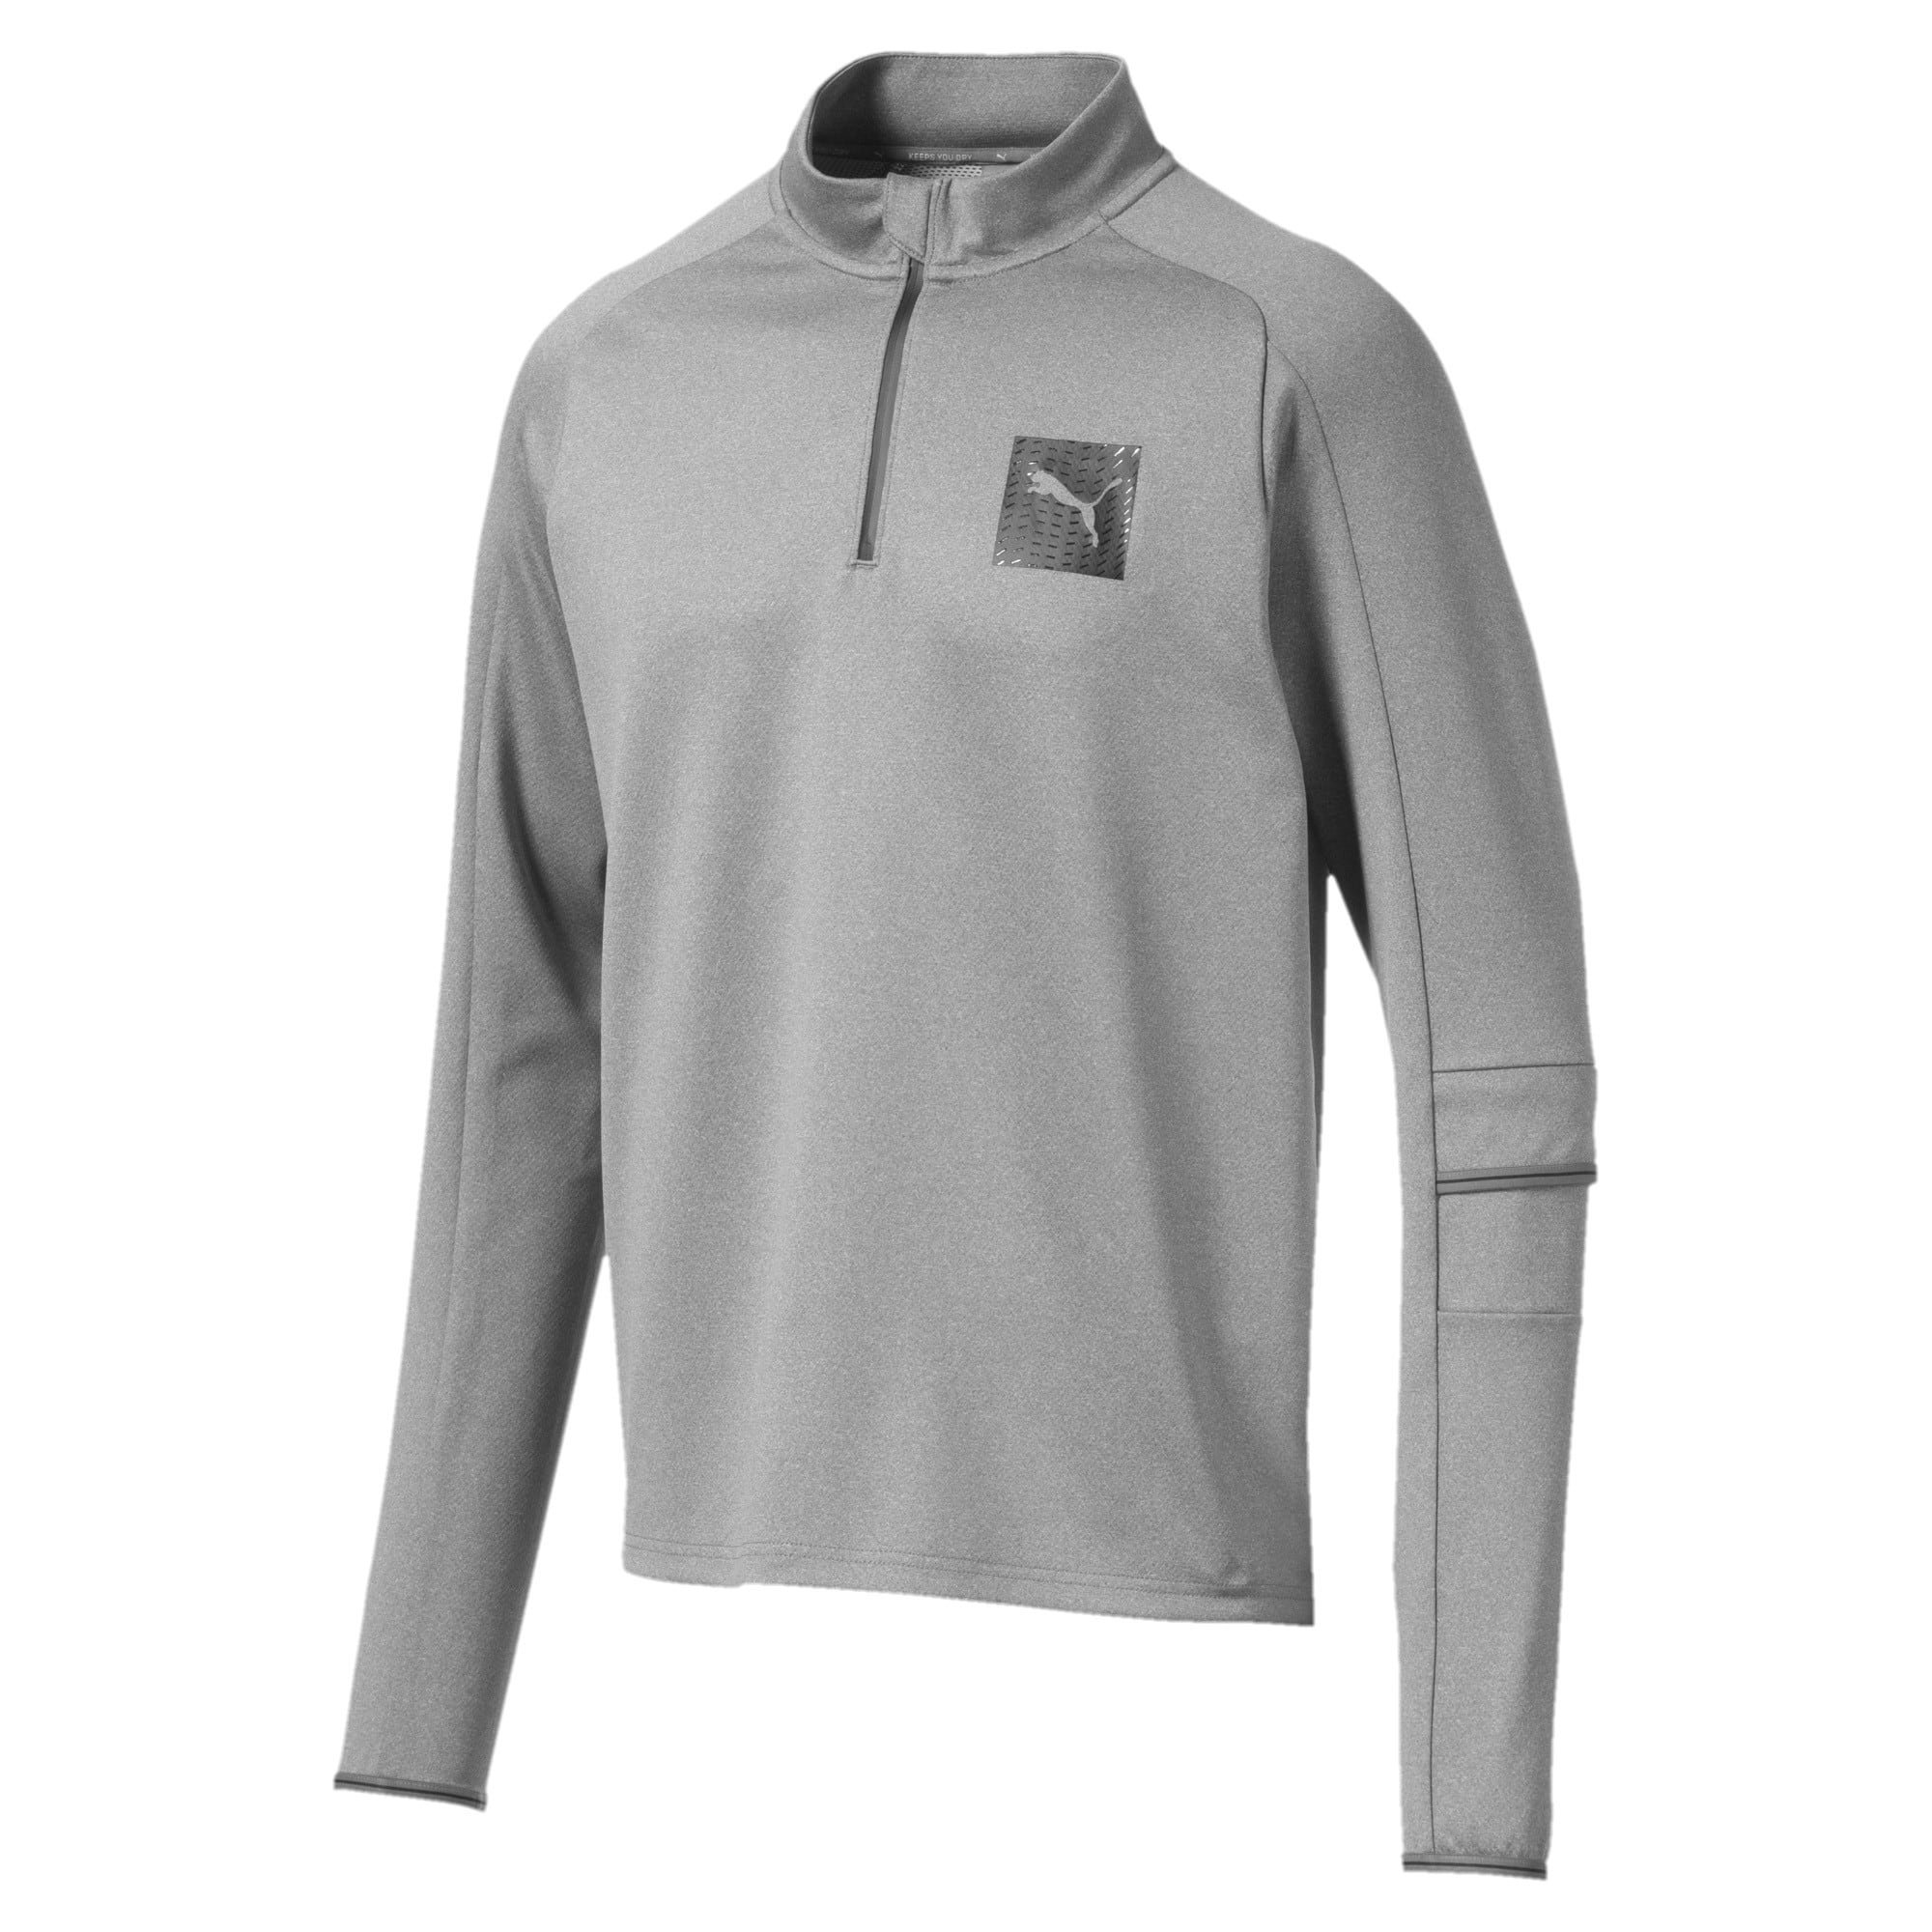 Thumbnail 4 of Tec Half Zip Men's Pullover, Medium Gray Heather, medium-IND